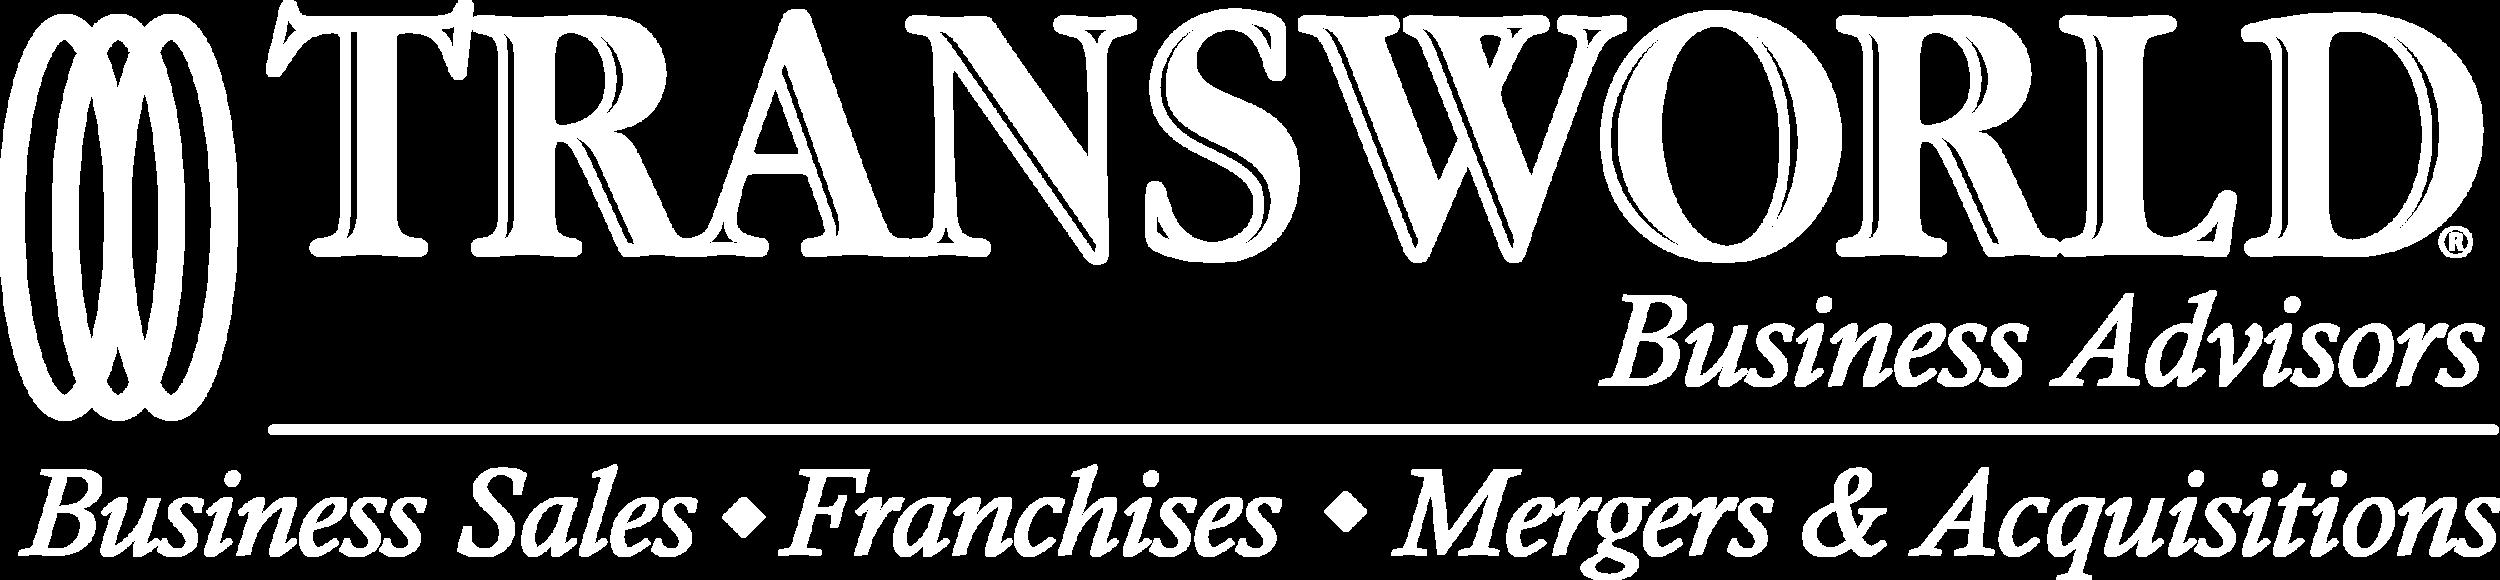 TW logo W.png